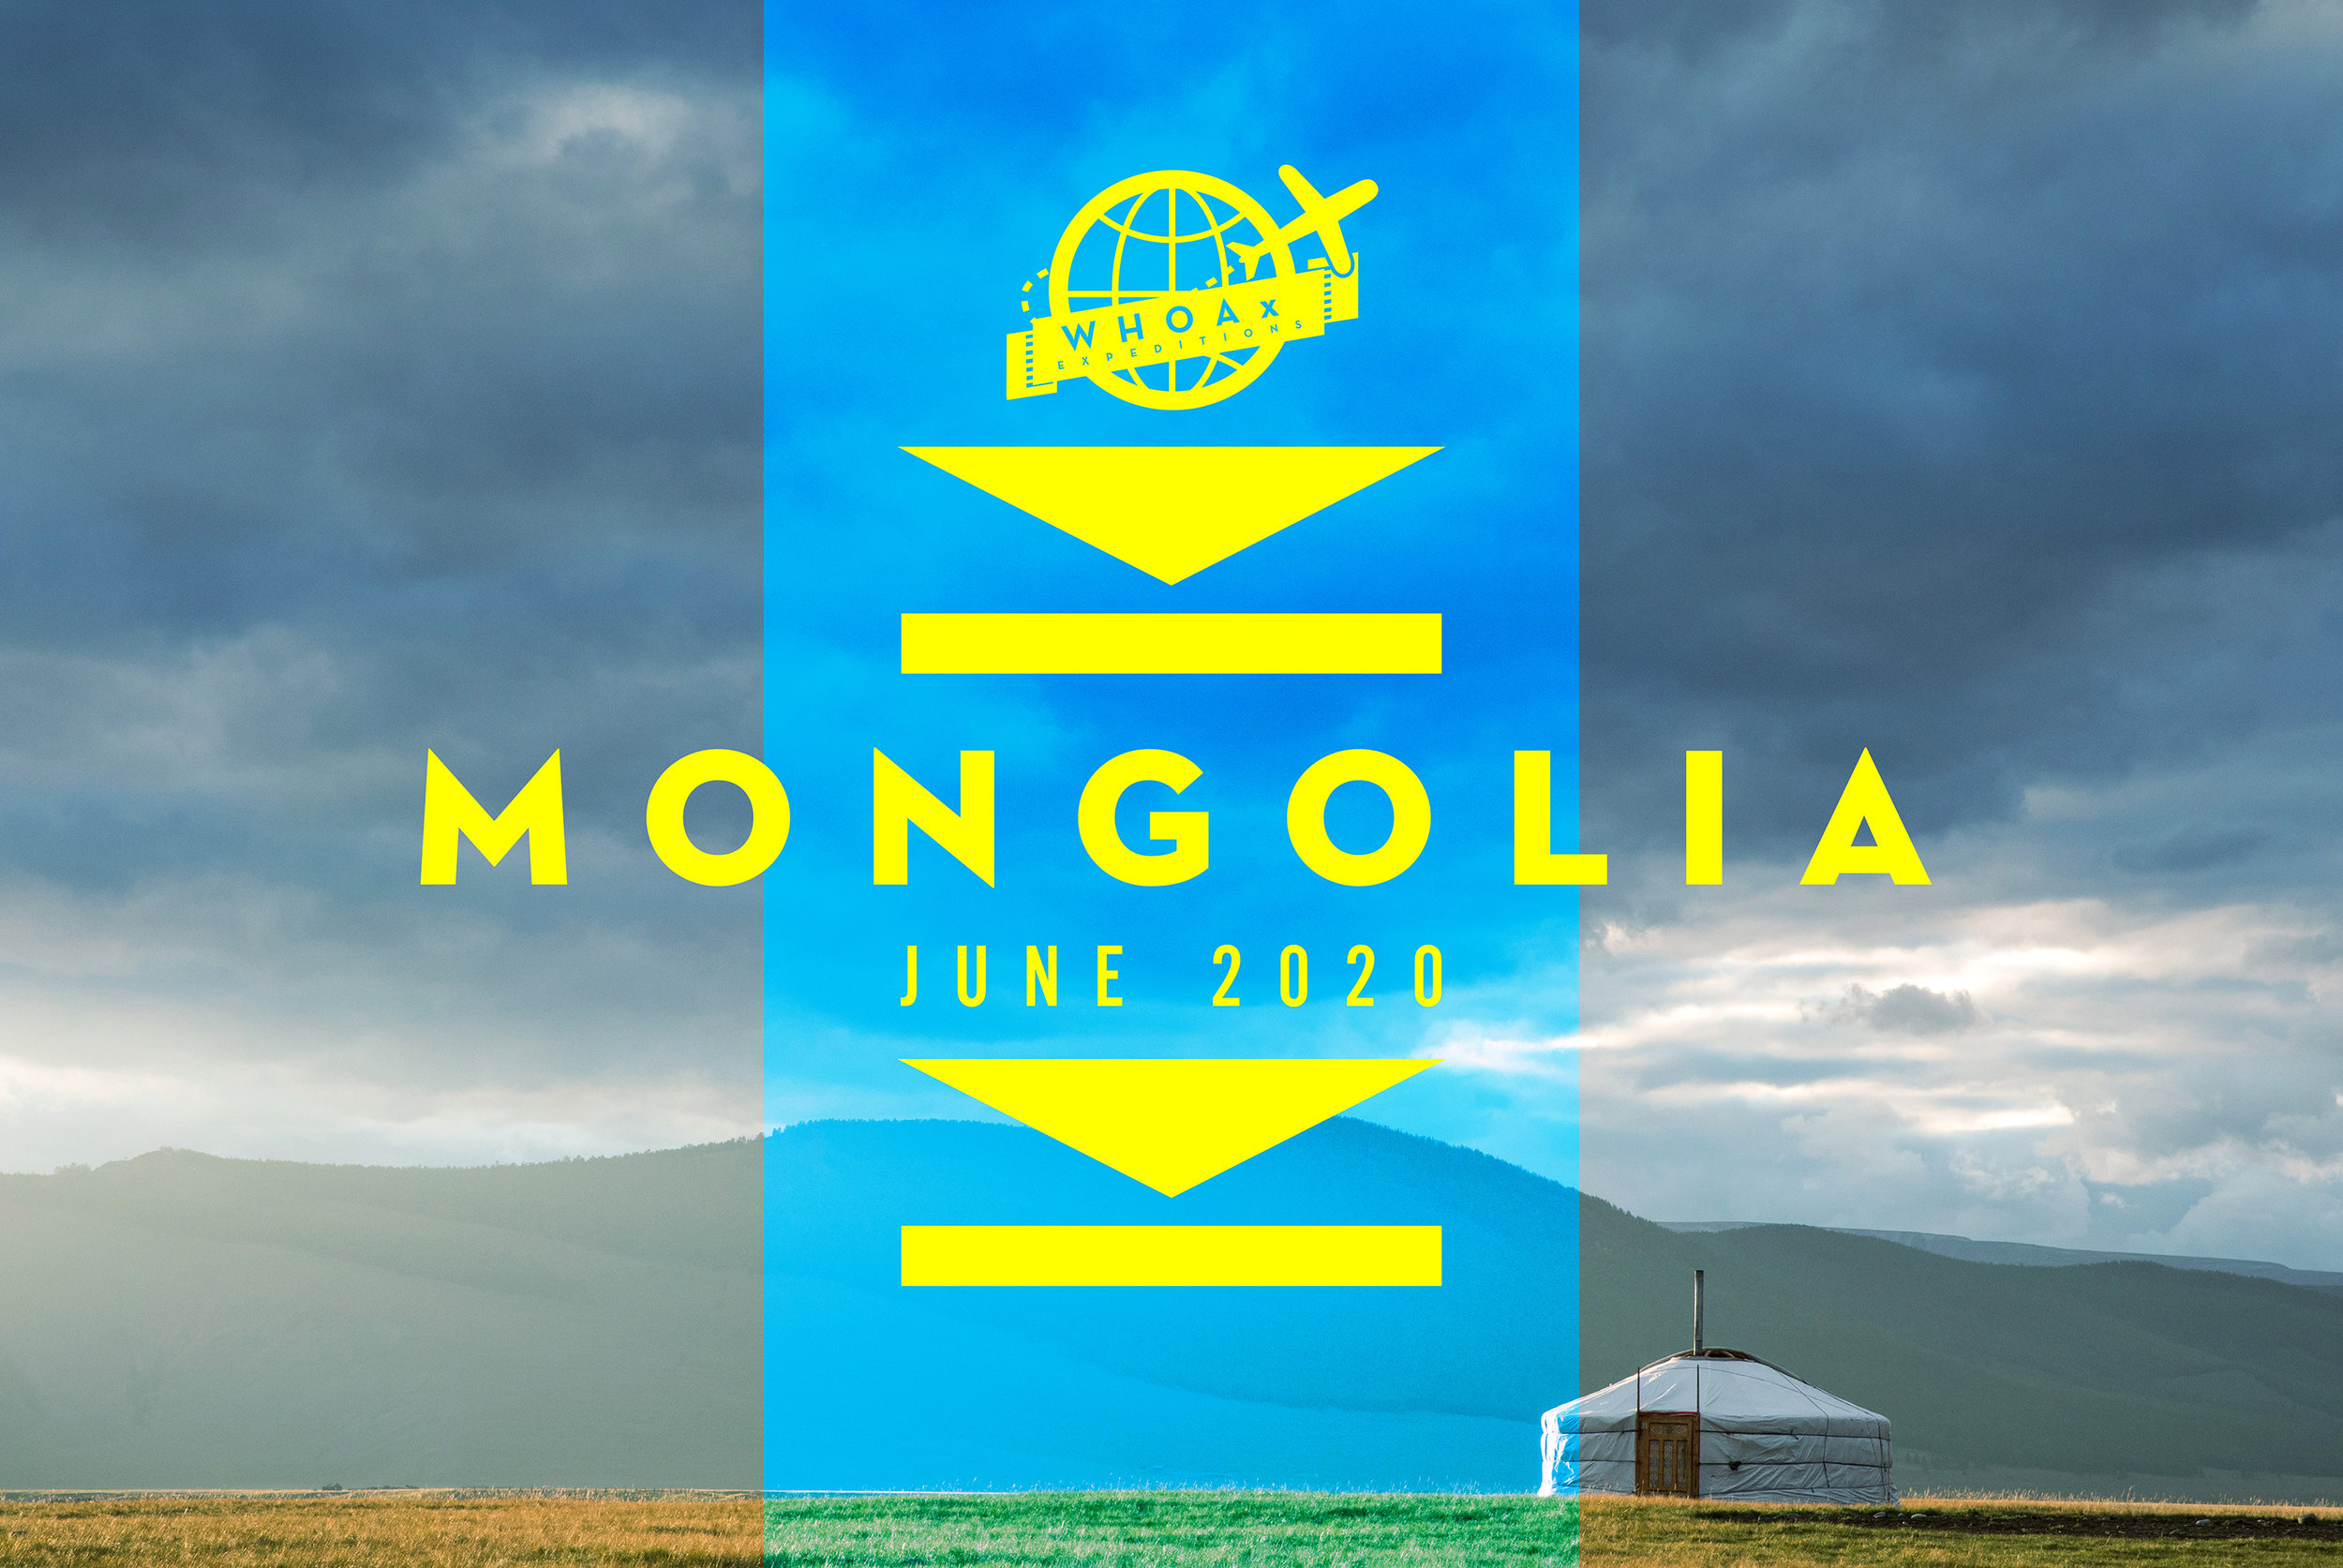 WHOAx 2020 MONGOLIA.jpg